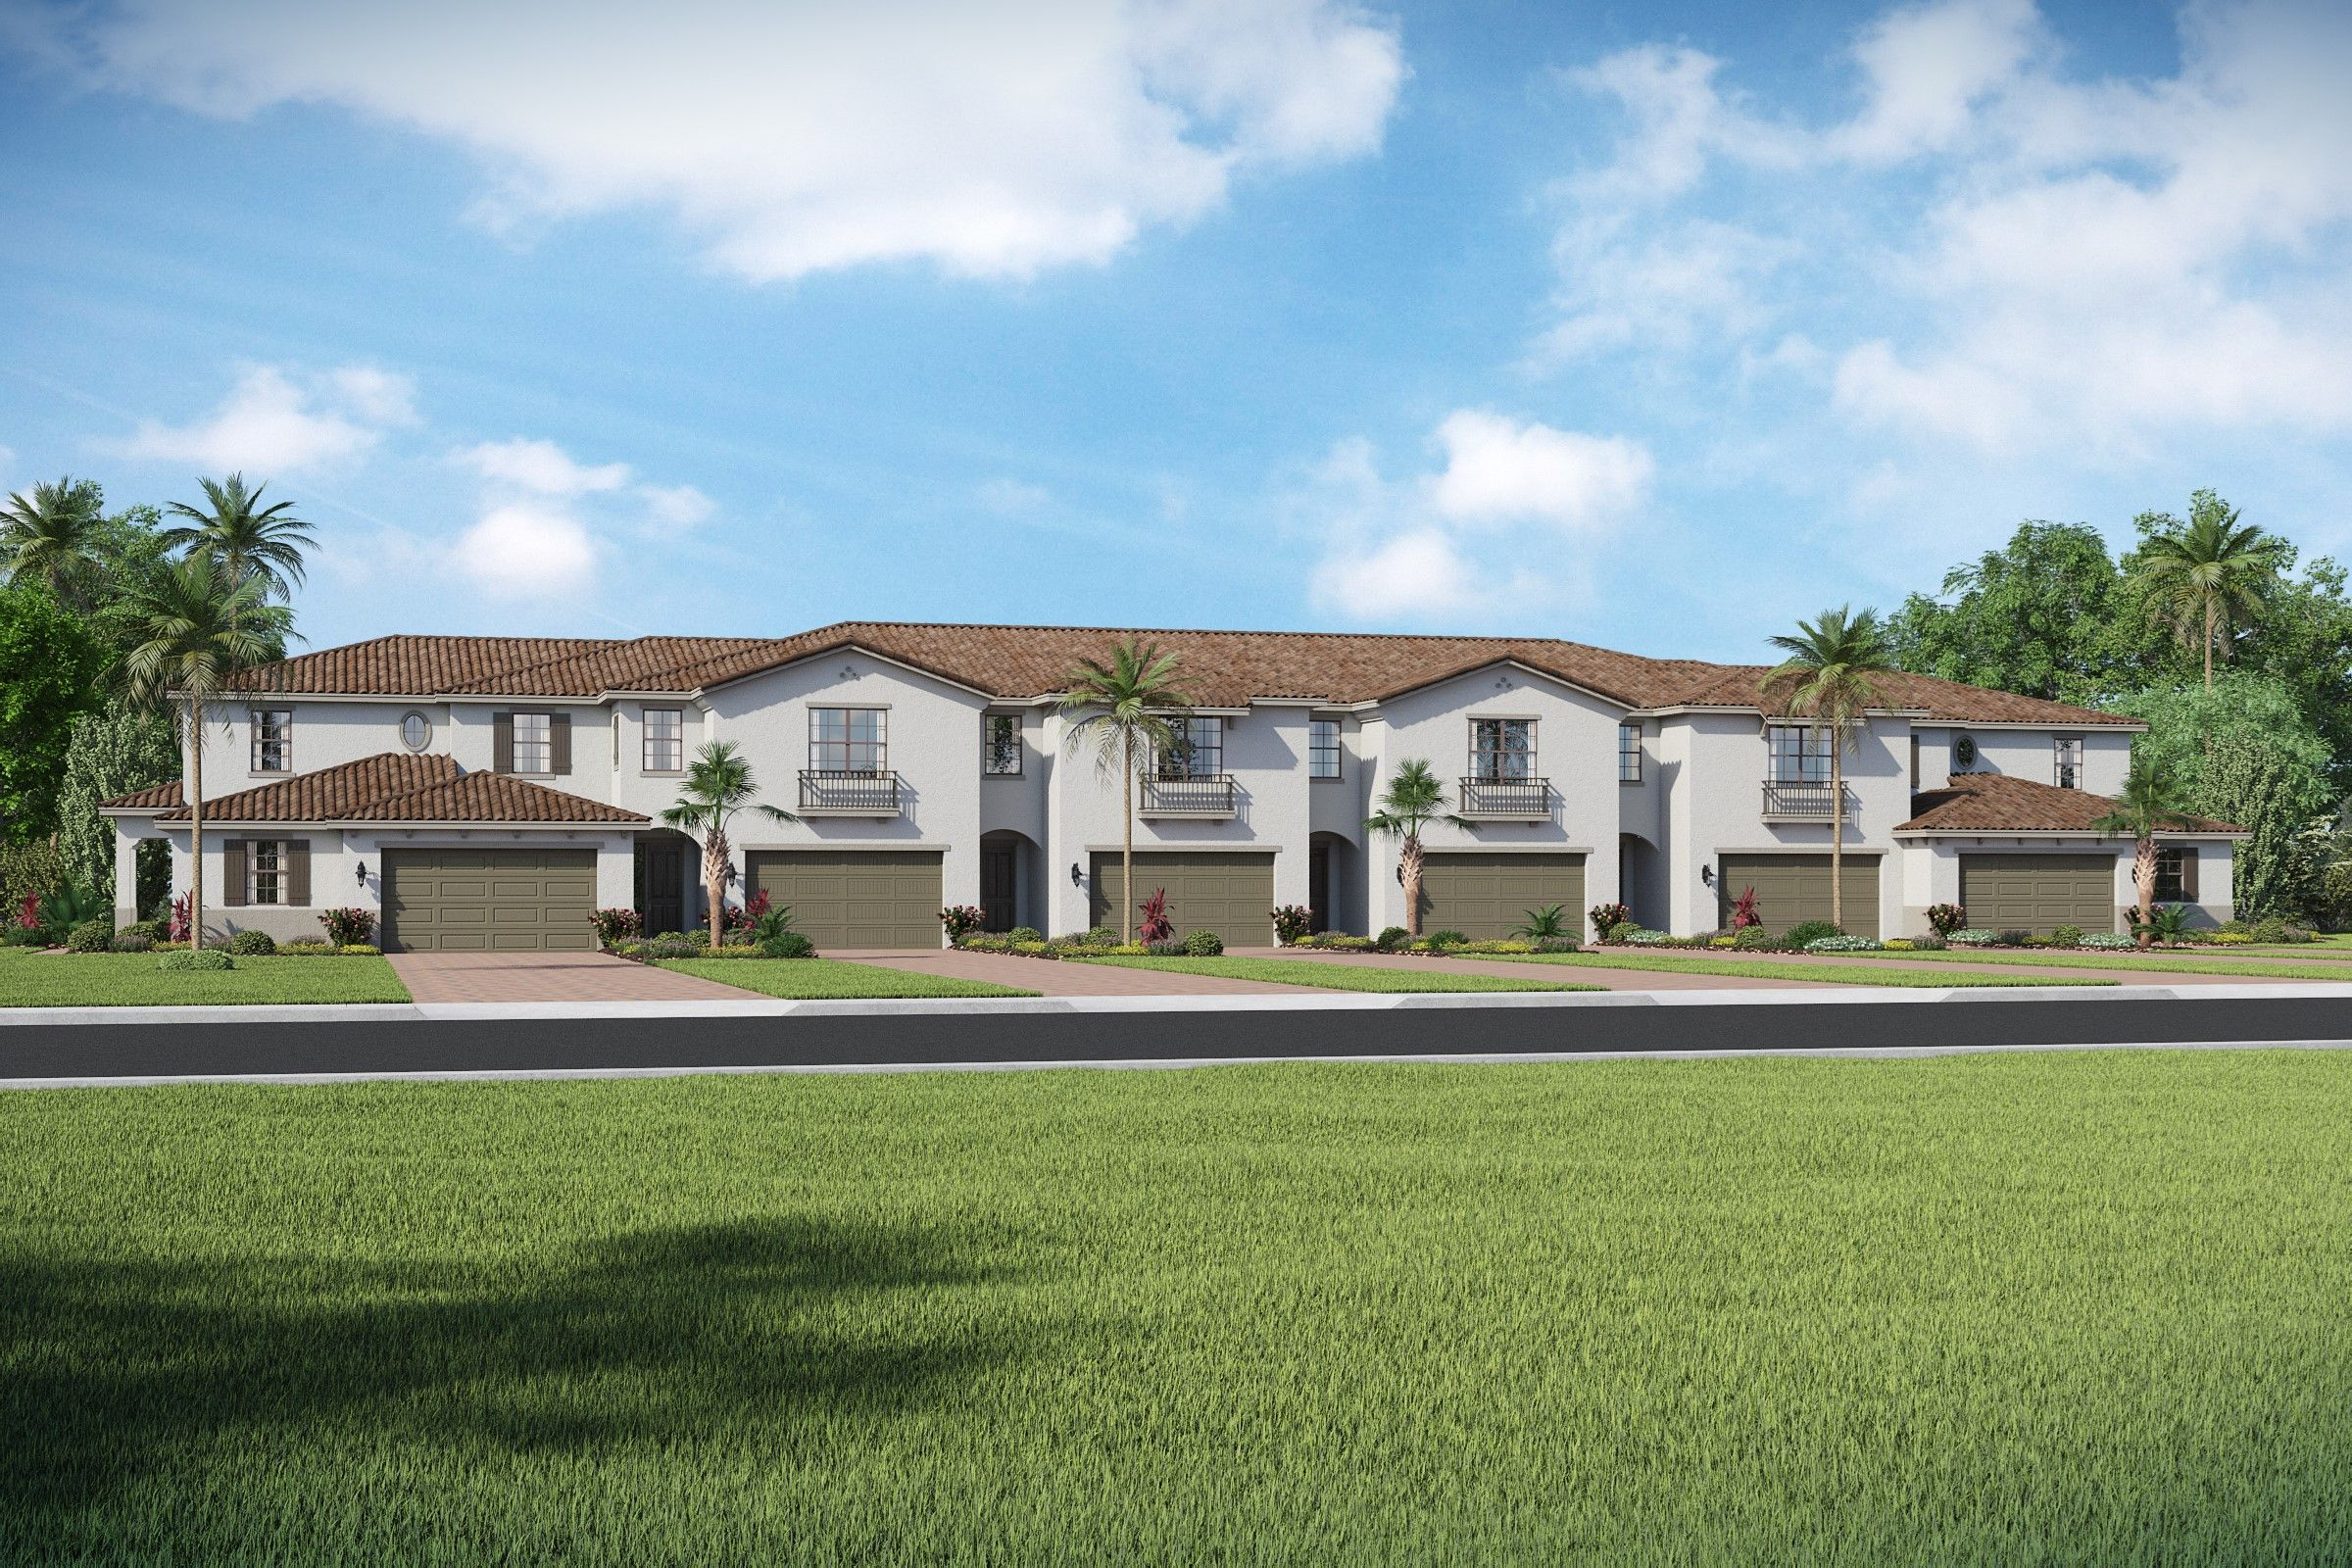 Multi Family for Sale at Callista Ii 10206 Akenside Drive, Homesite 21 Boca Raton, Florida 33428 United States